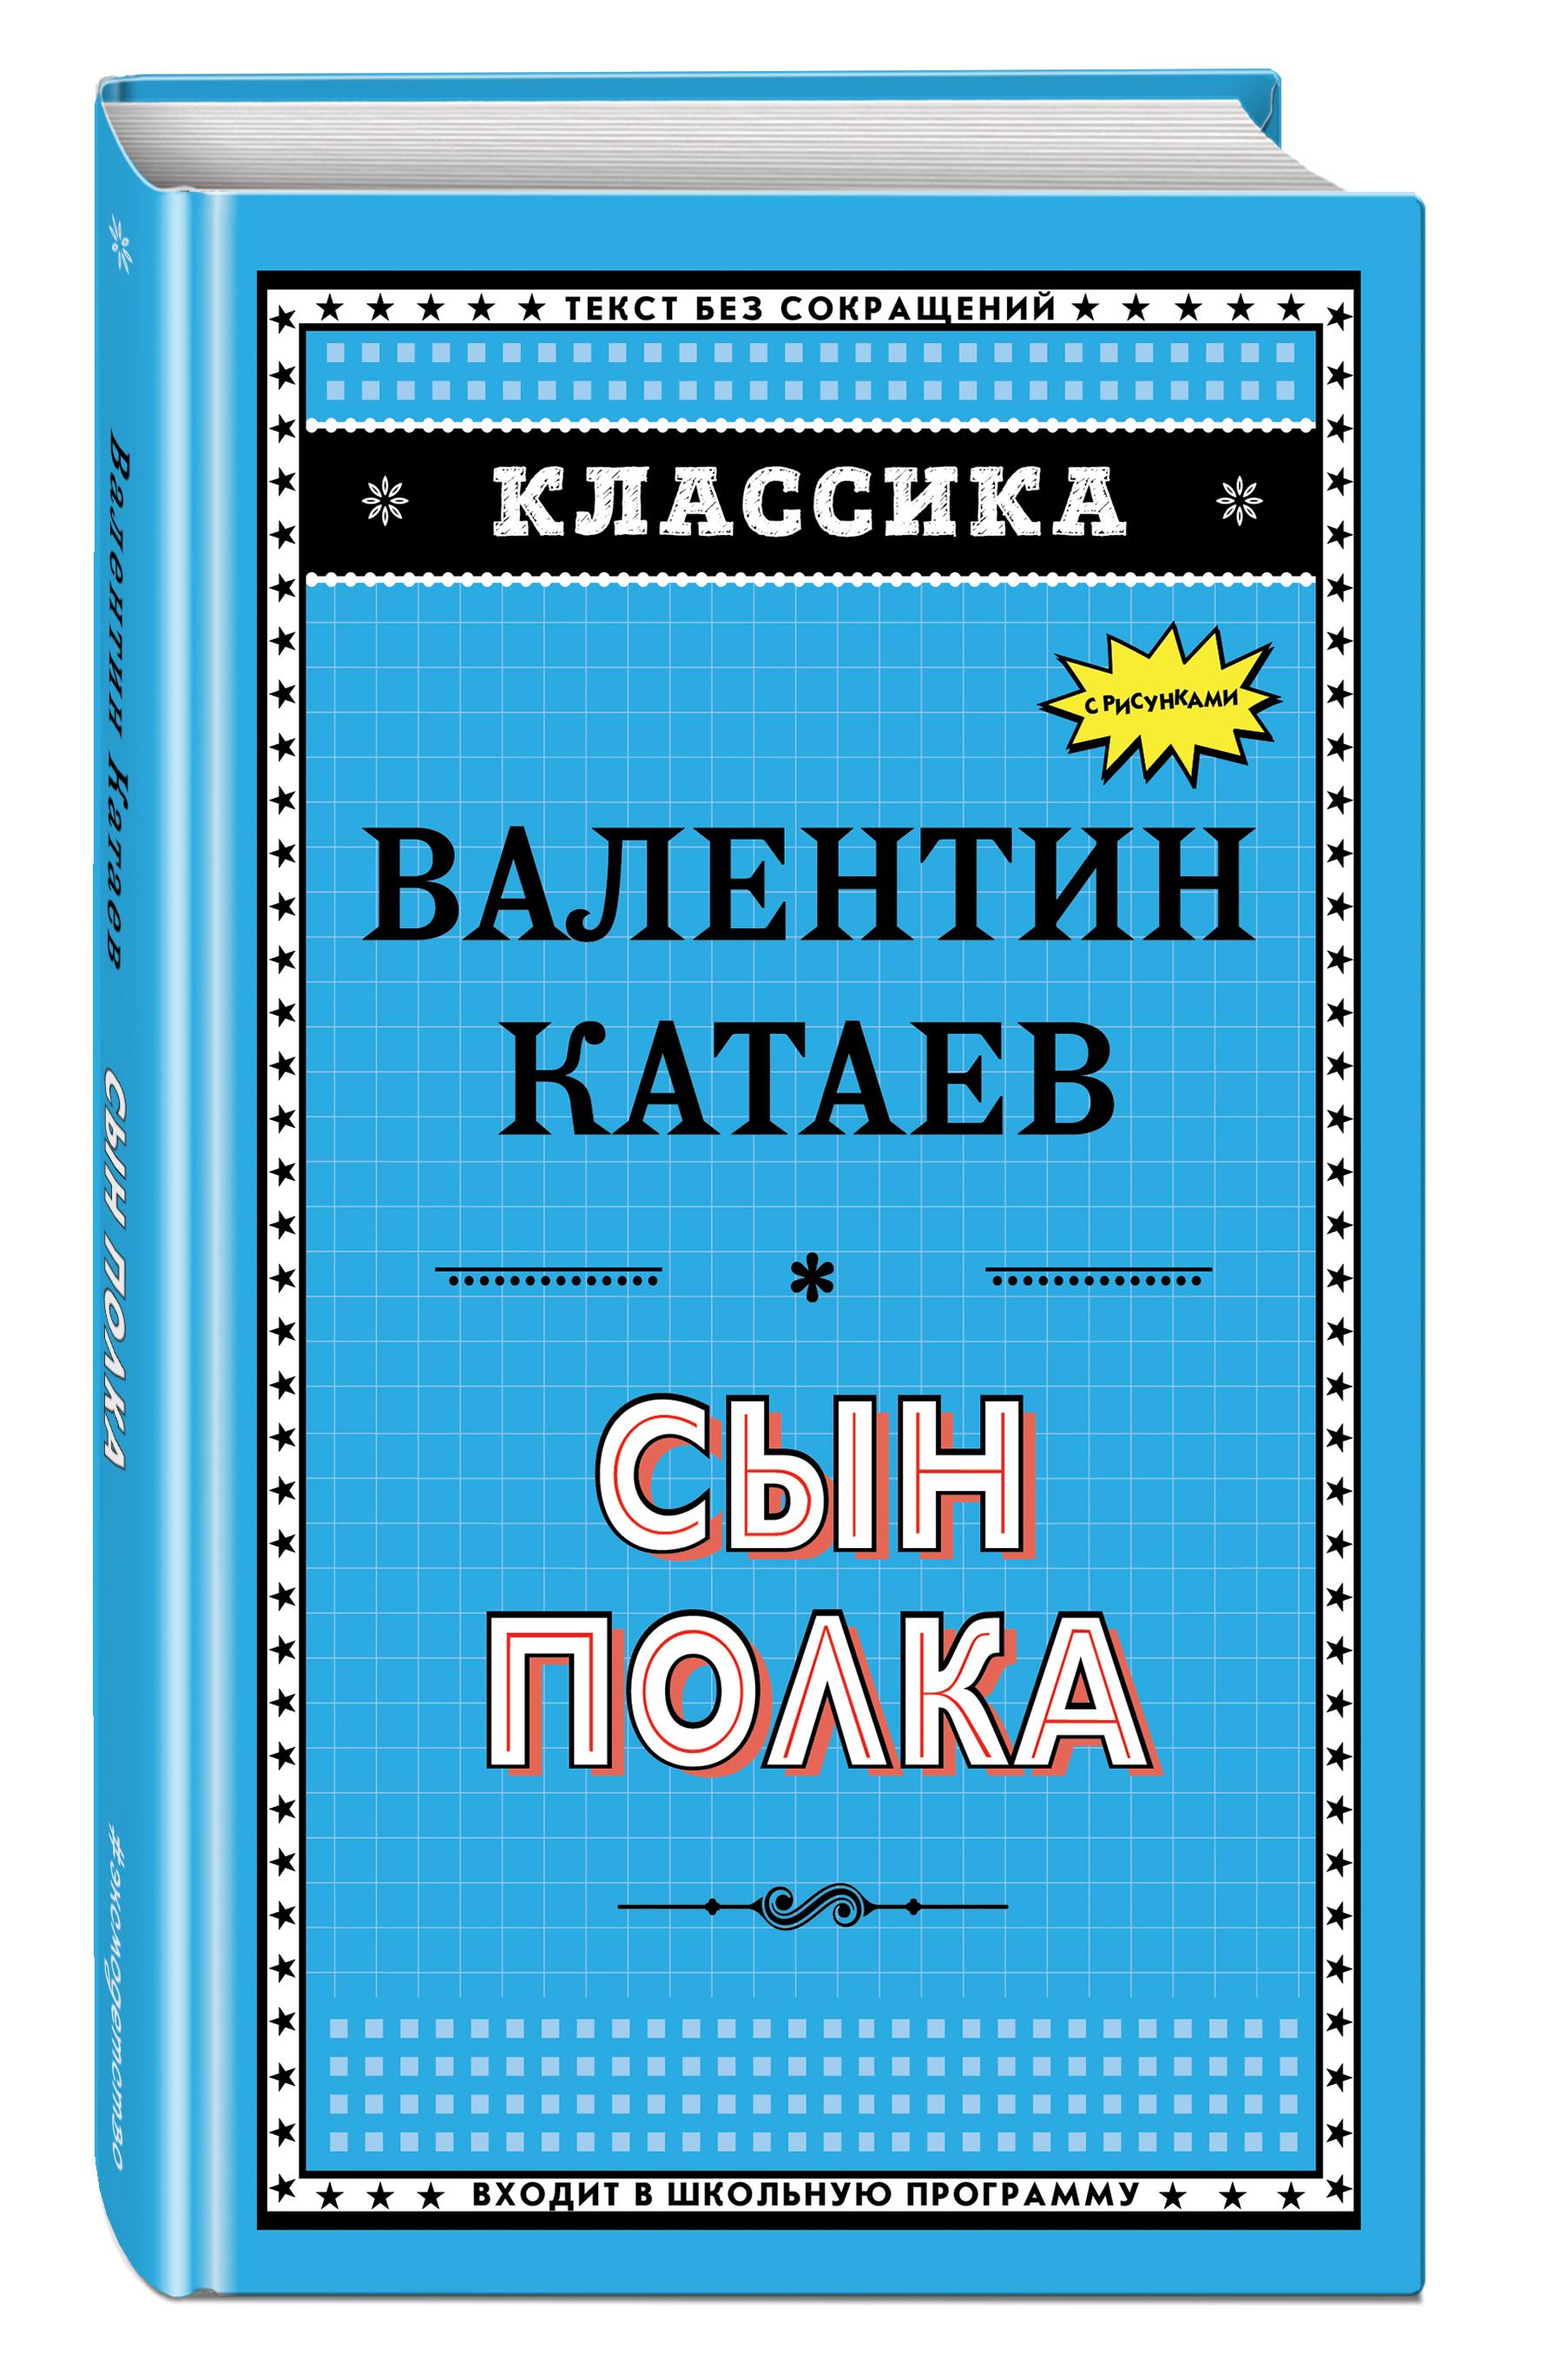 Сын полка ( Катаев В.П.  )